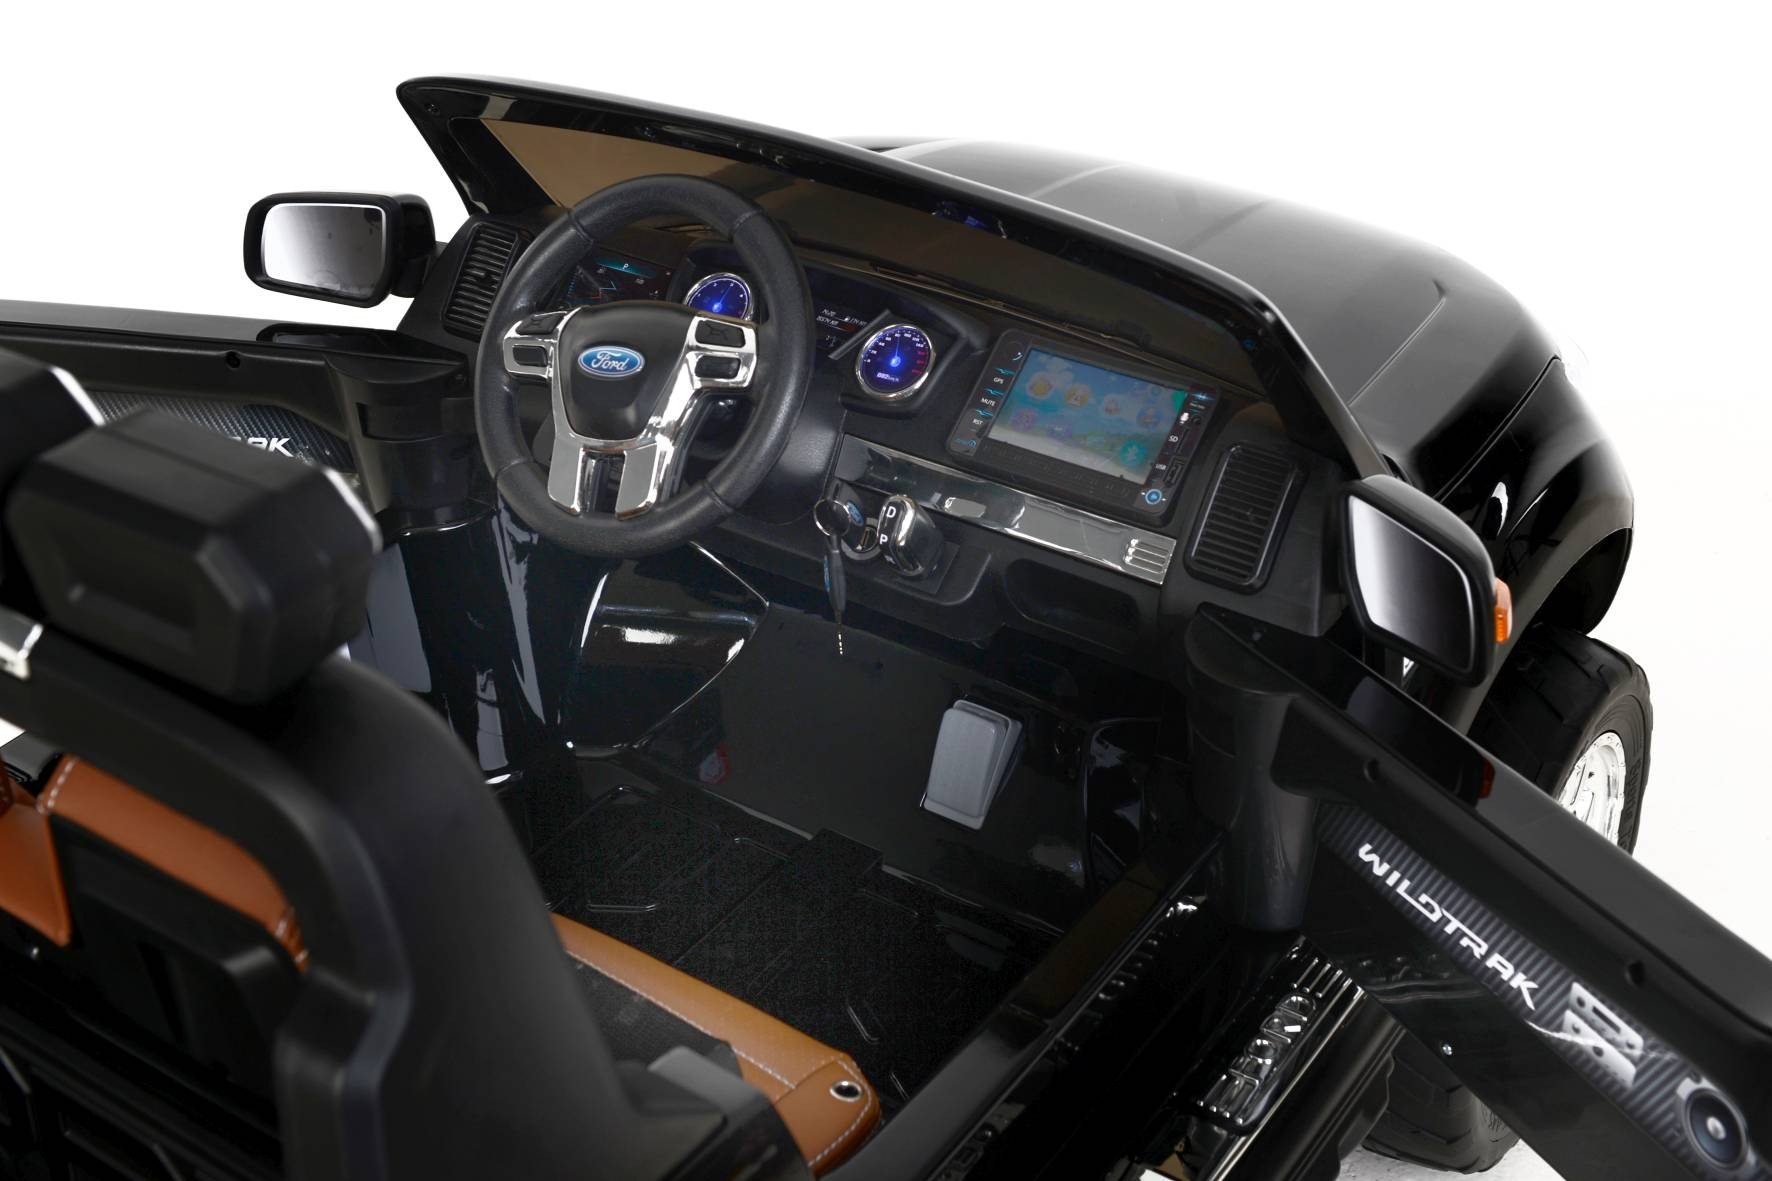 Todoterreno electrico infantil Ford Ranger MP4 Negro Metalizado detalles del interior